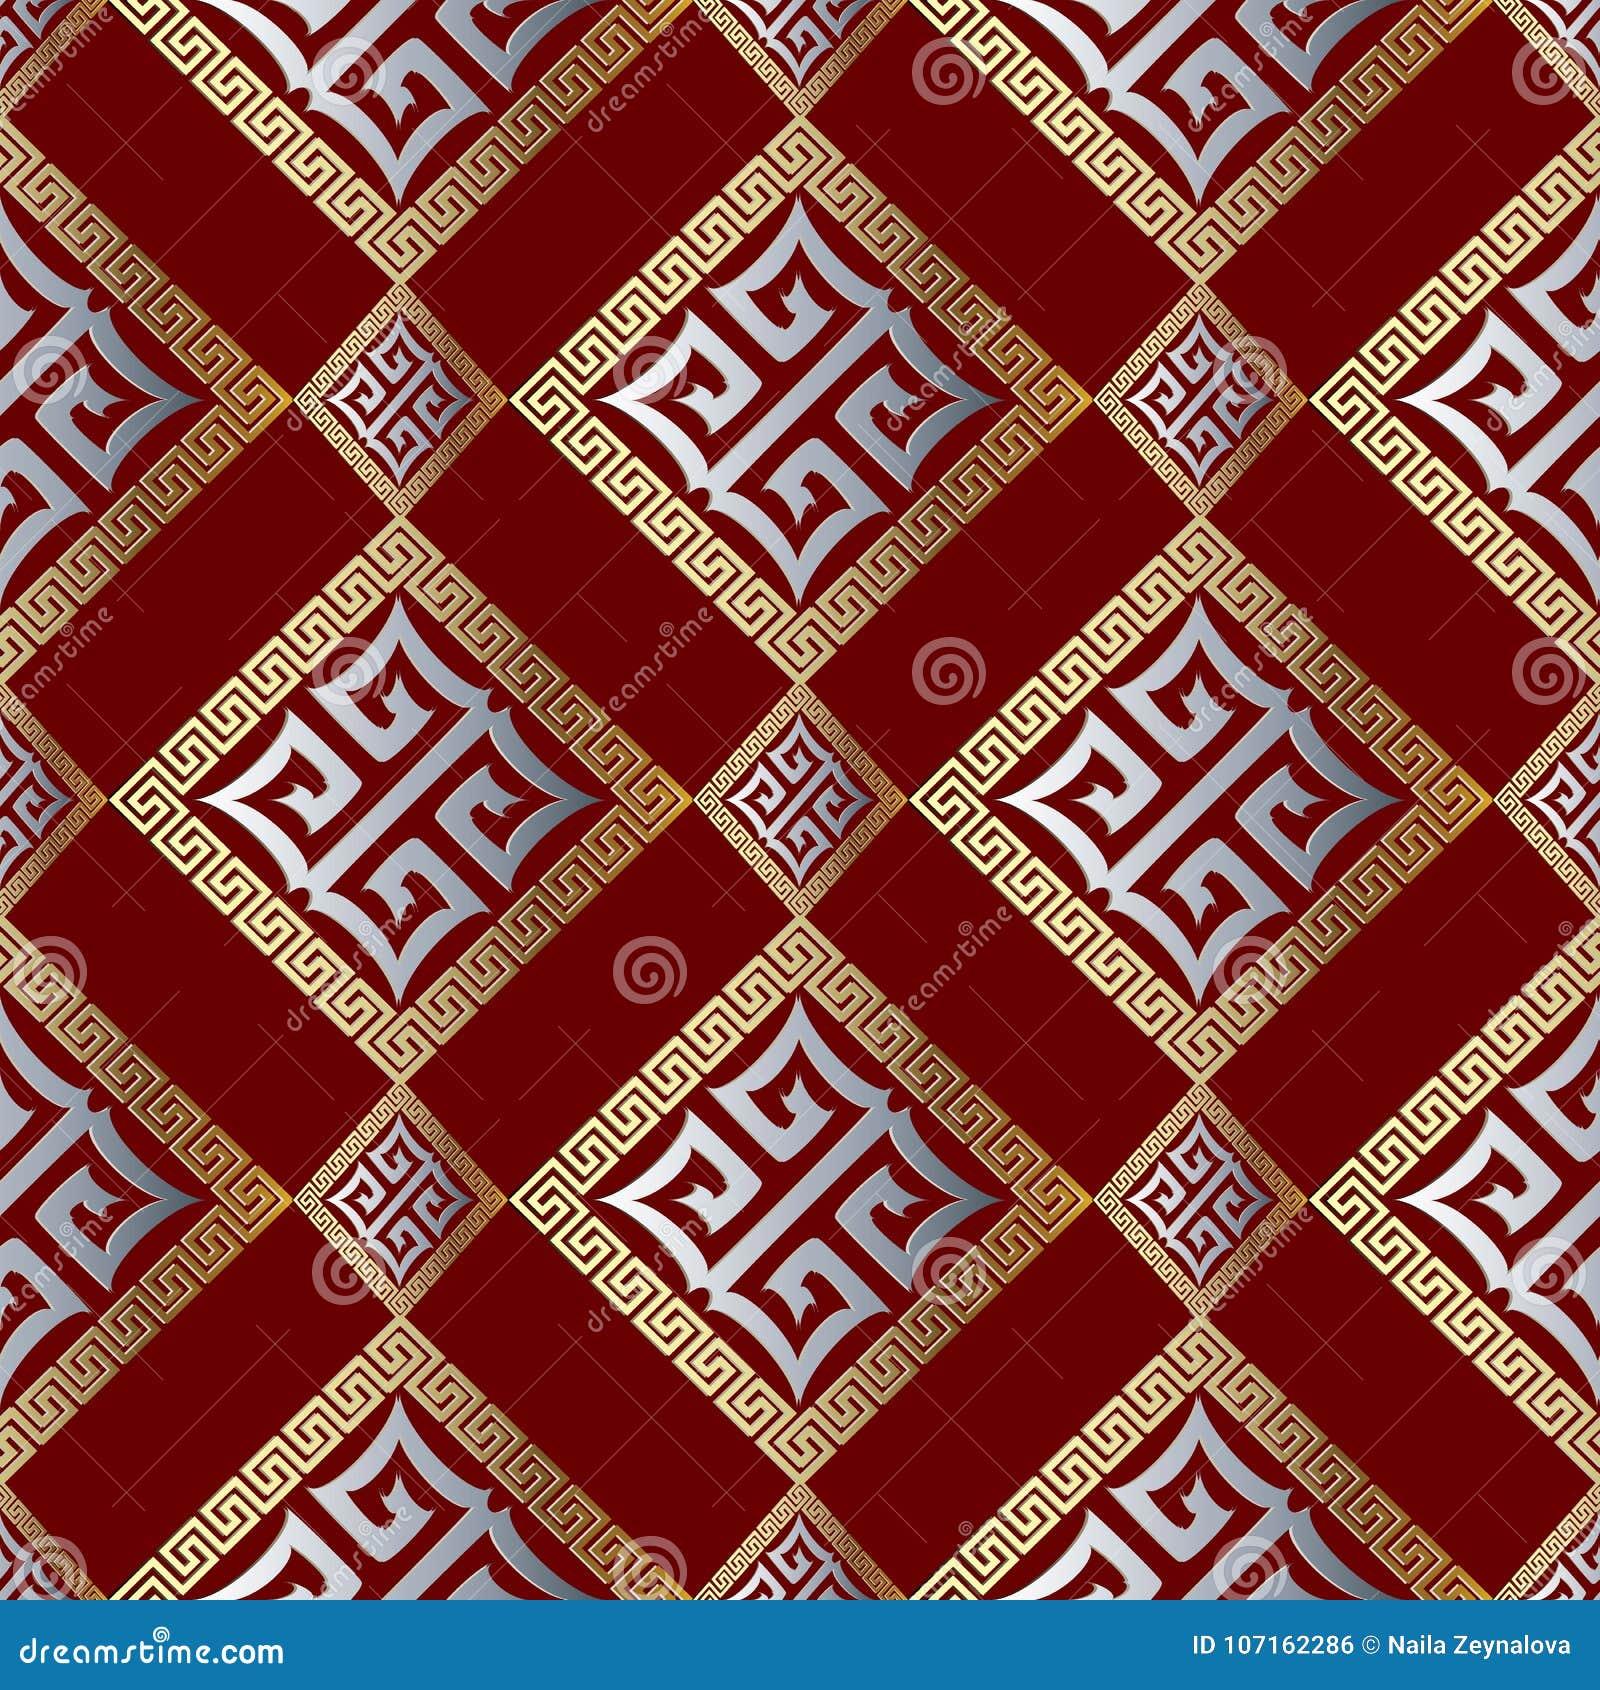 Modern Geometric Greek Key Seamless Pattern Abstract Red